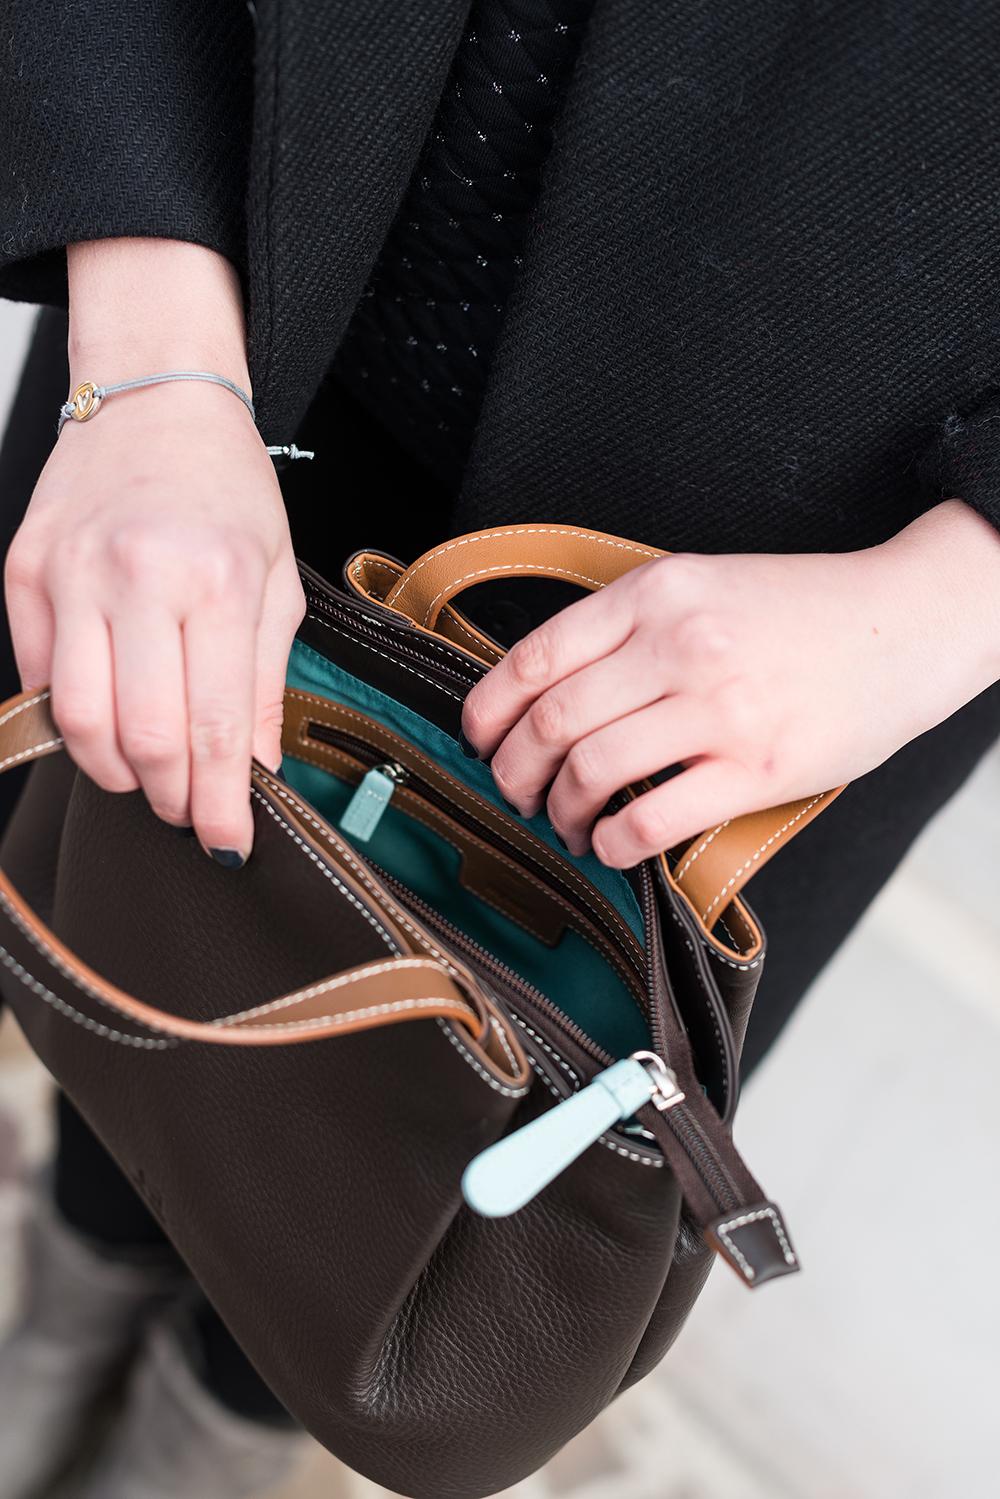 andysparkles-mywalit Bag Verona-Outfit